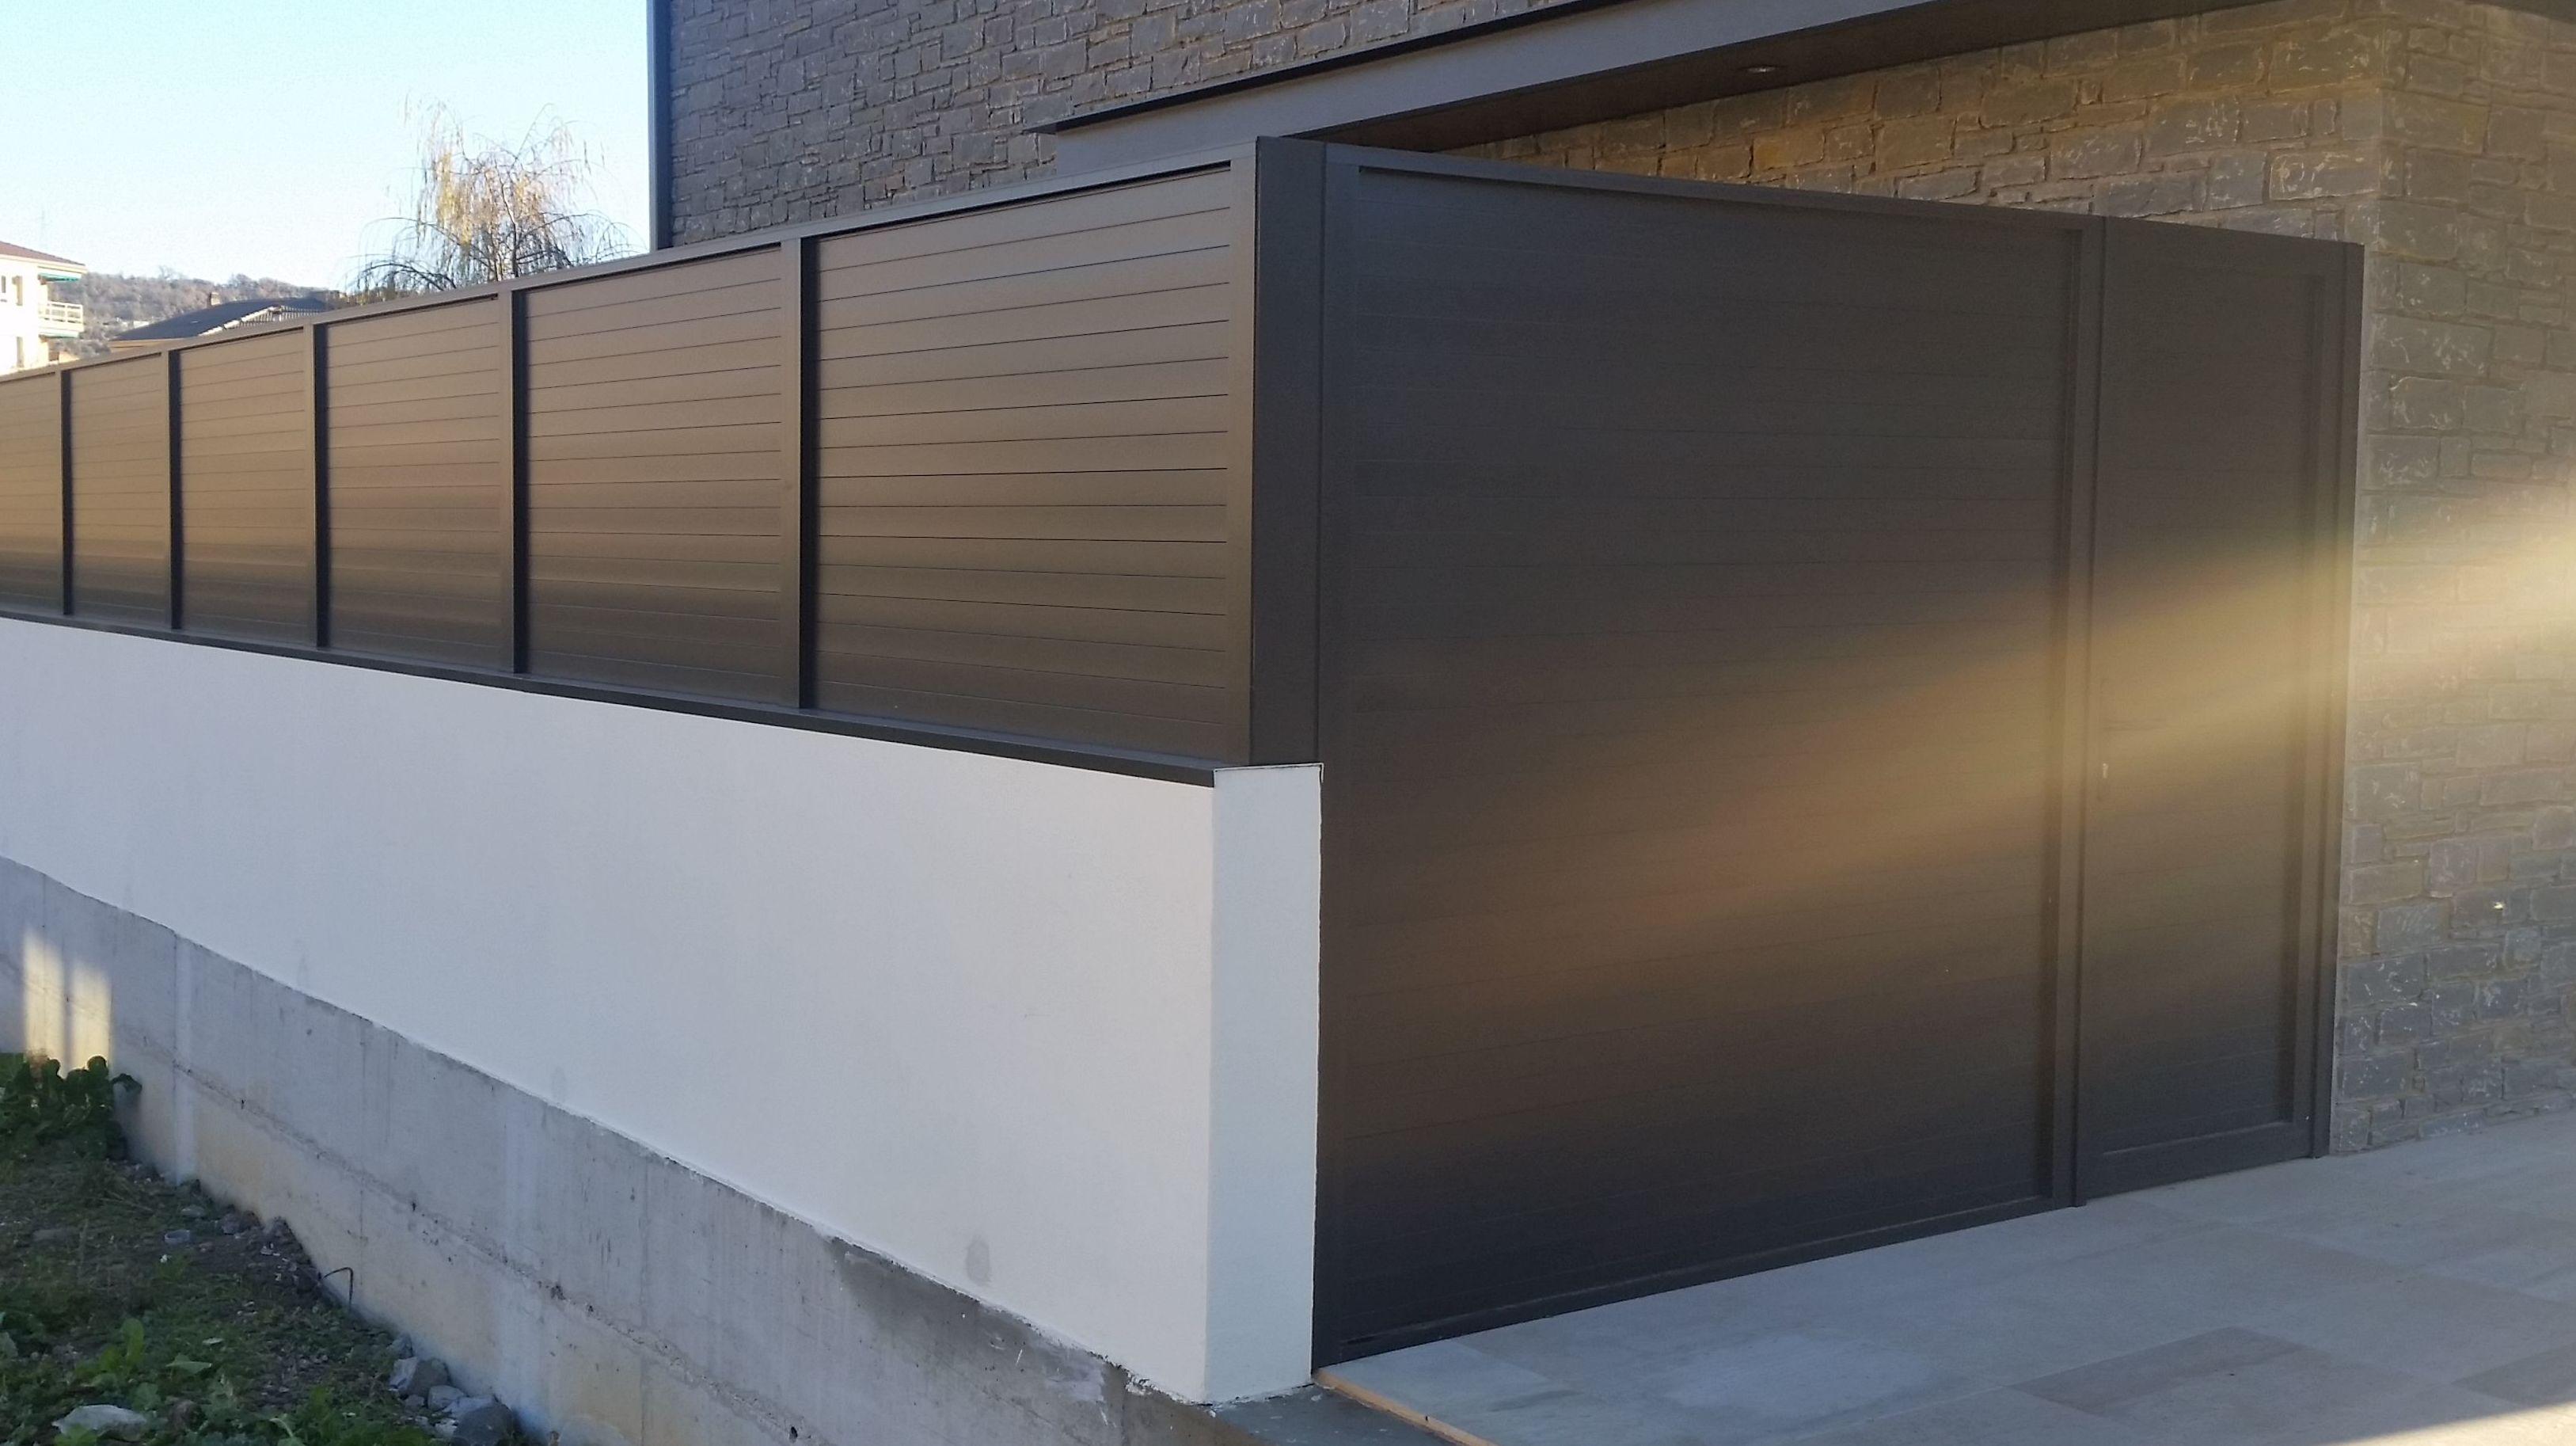 Foto 8 de Carpintería de aluminio, metálica y PVC en Calafell | Aluminis Solé